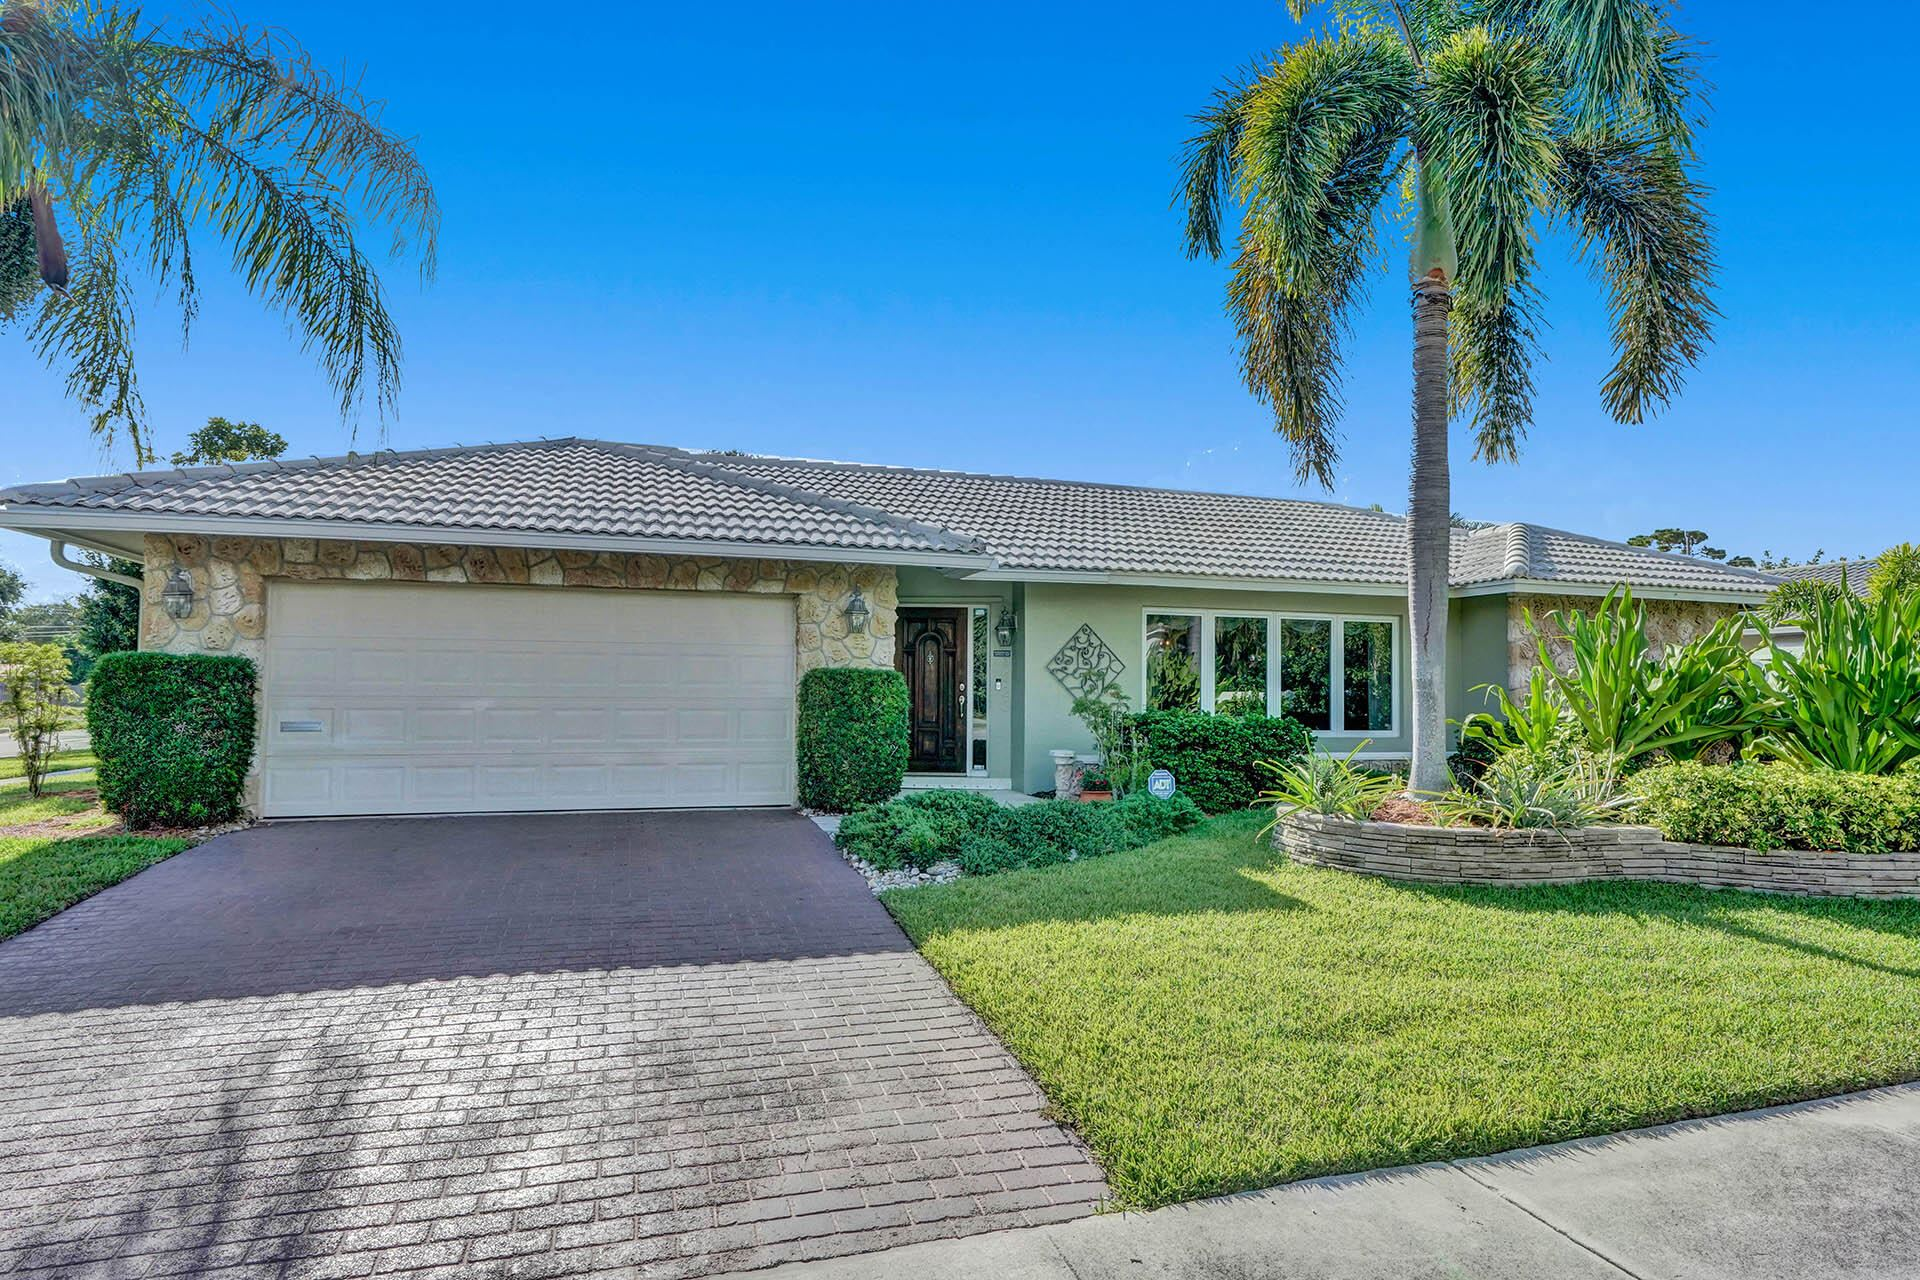 1020 SW 2nd Street, Boca Raton, FL 33486 - MLS#: RX-10723481